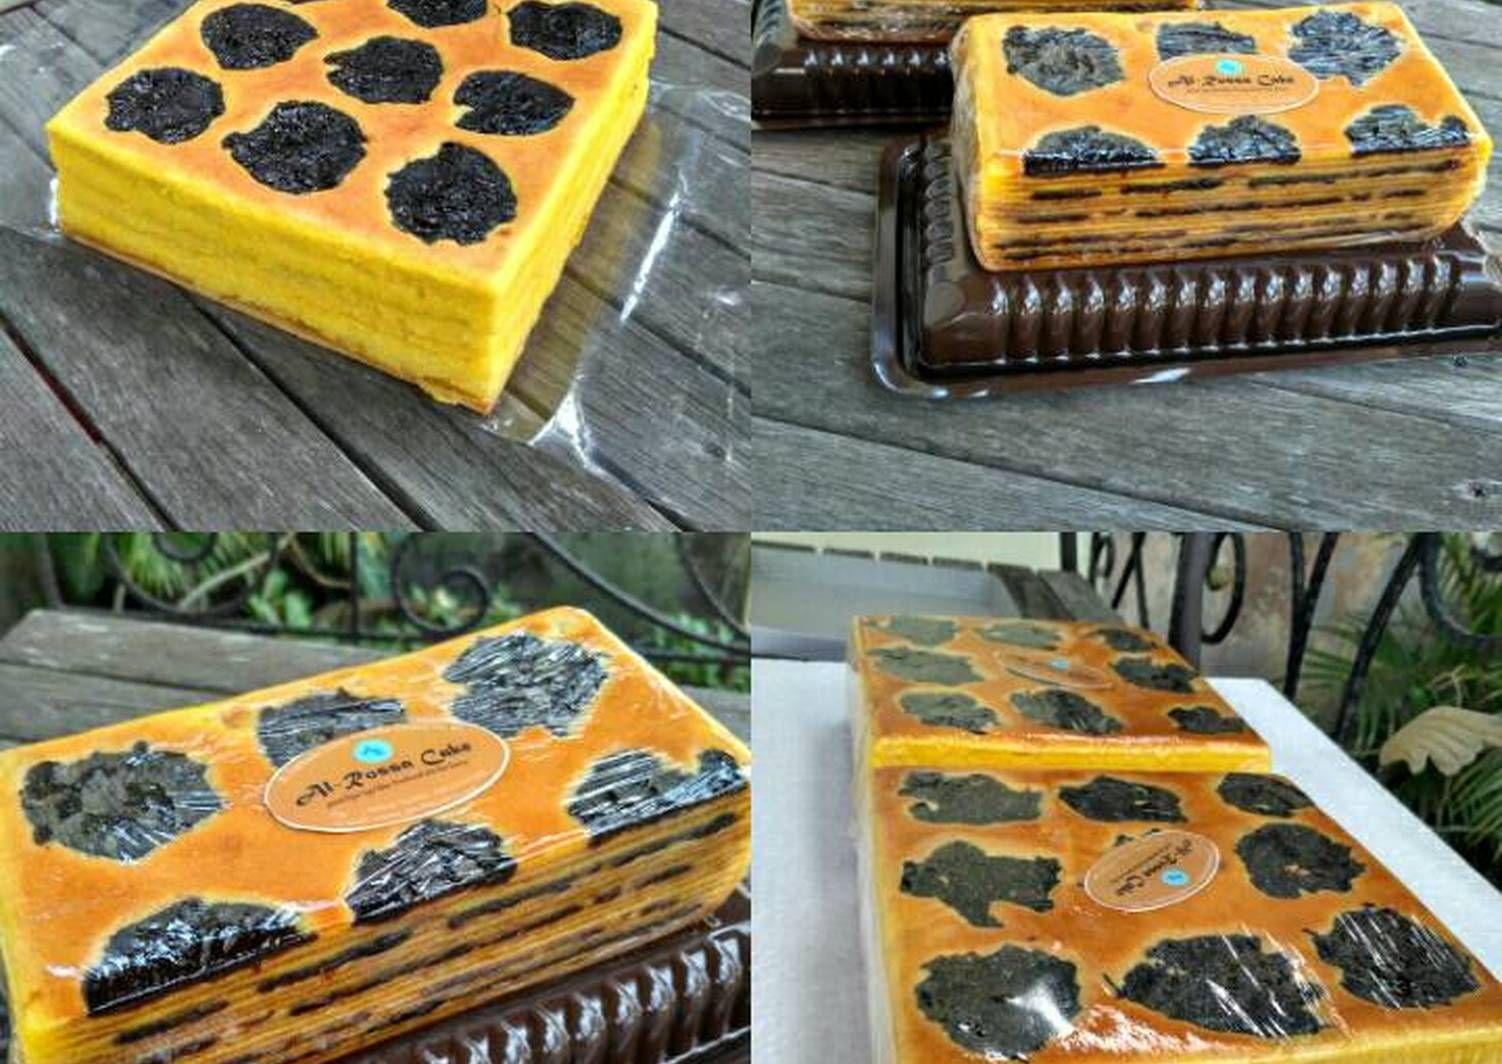 Resep Lapis Prunes Oleh Emma Rosa Resep Kue Lapis Kue Makanan